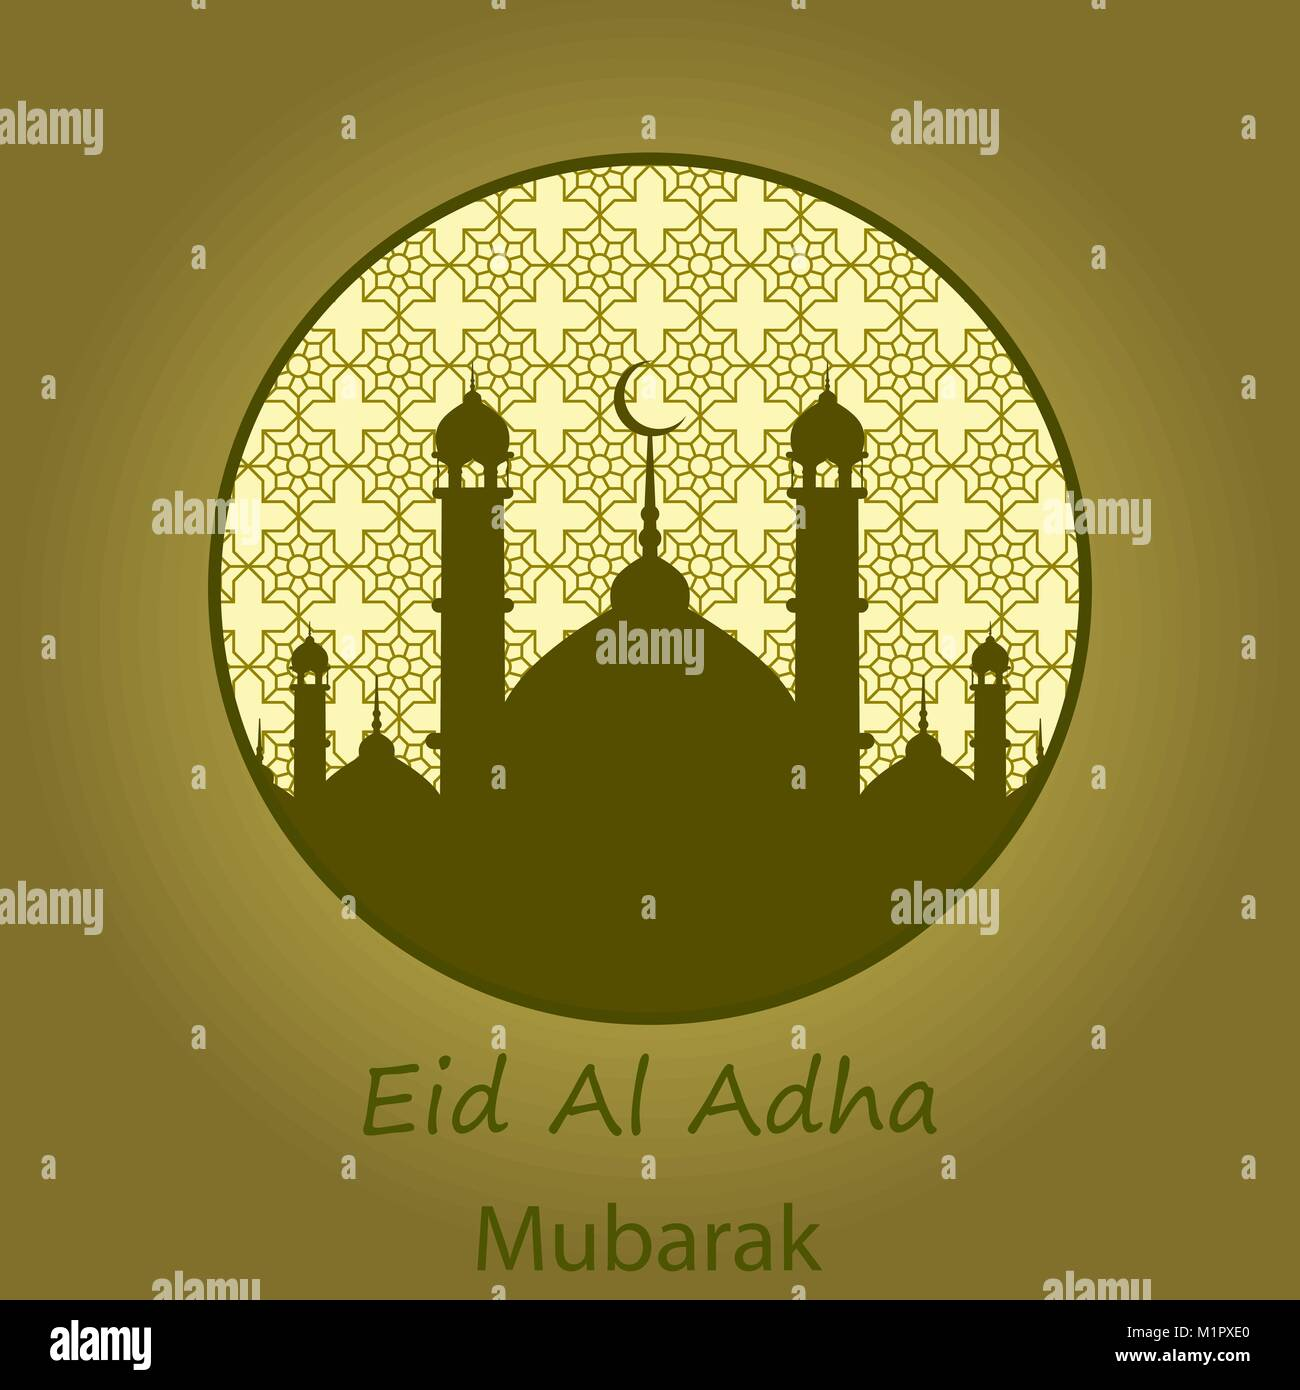 Islamic festival of sacrifice eid al adha mubarak greeting card islamic festival of sacrifice eid al adha mubarak greeting card vector background m4hsunfo